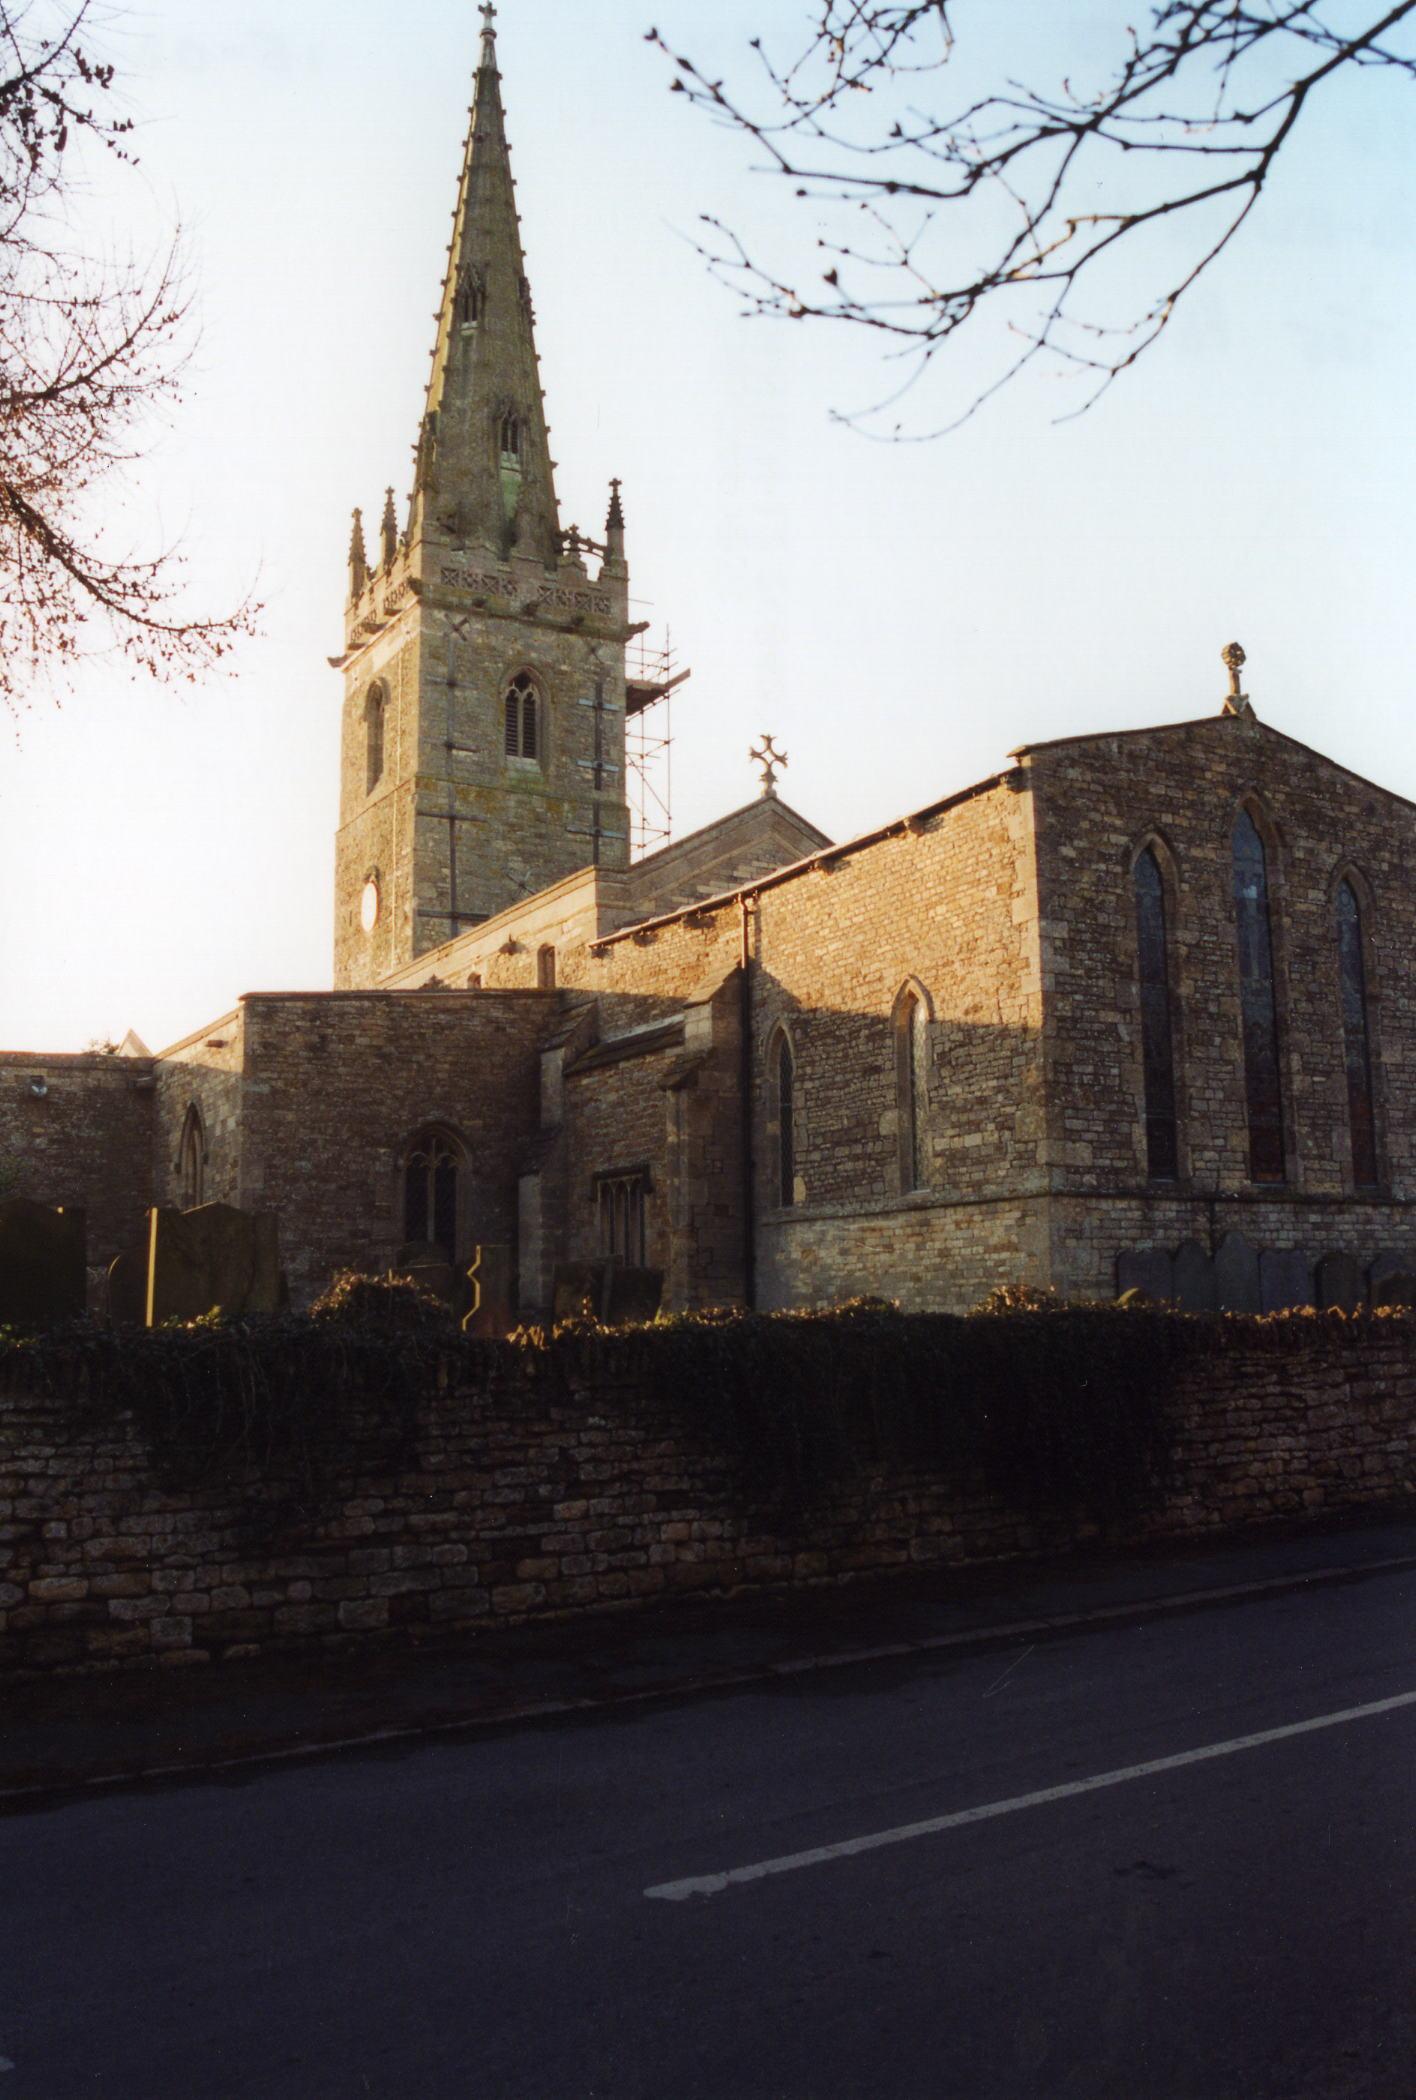 Coleby All Saints parish church